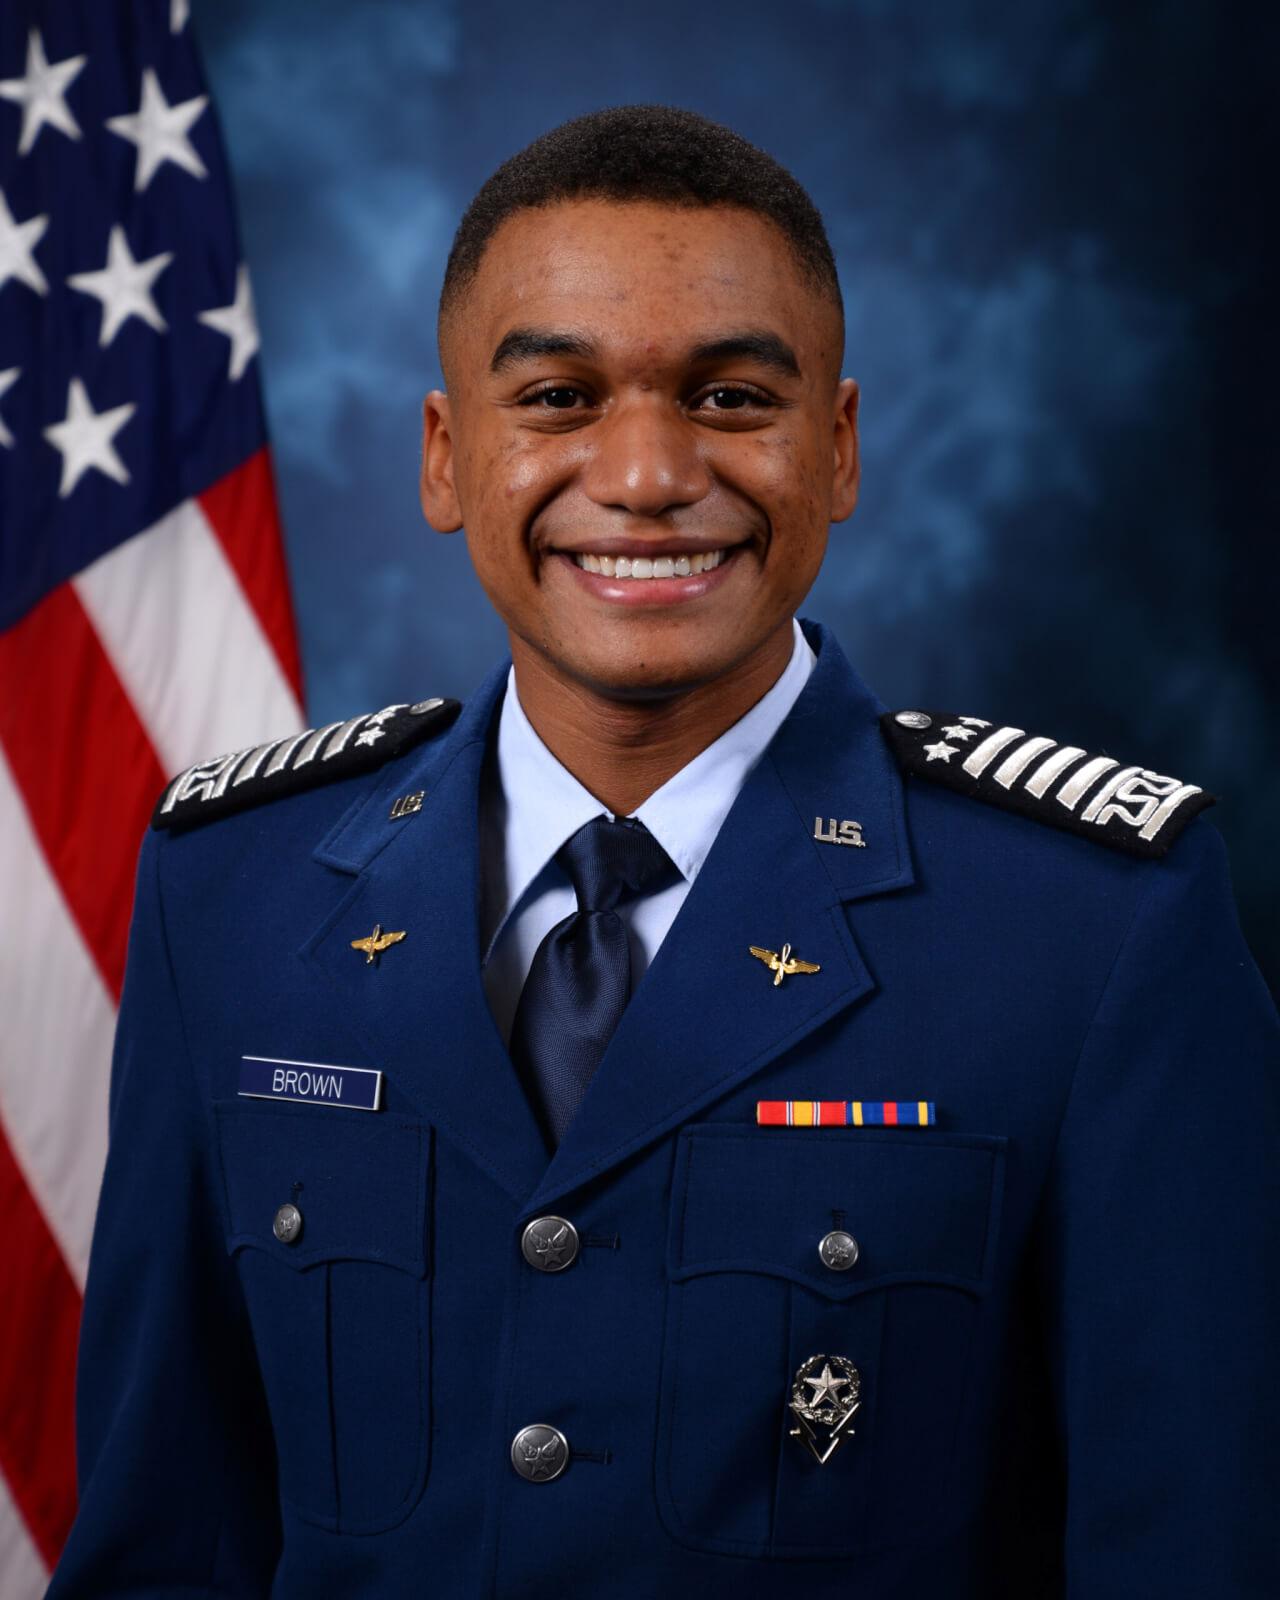 Cadet 1st Class Aryemis Brown, recipient of the Rhodes scholarship